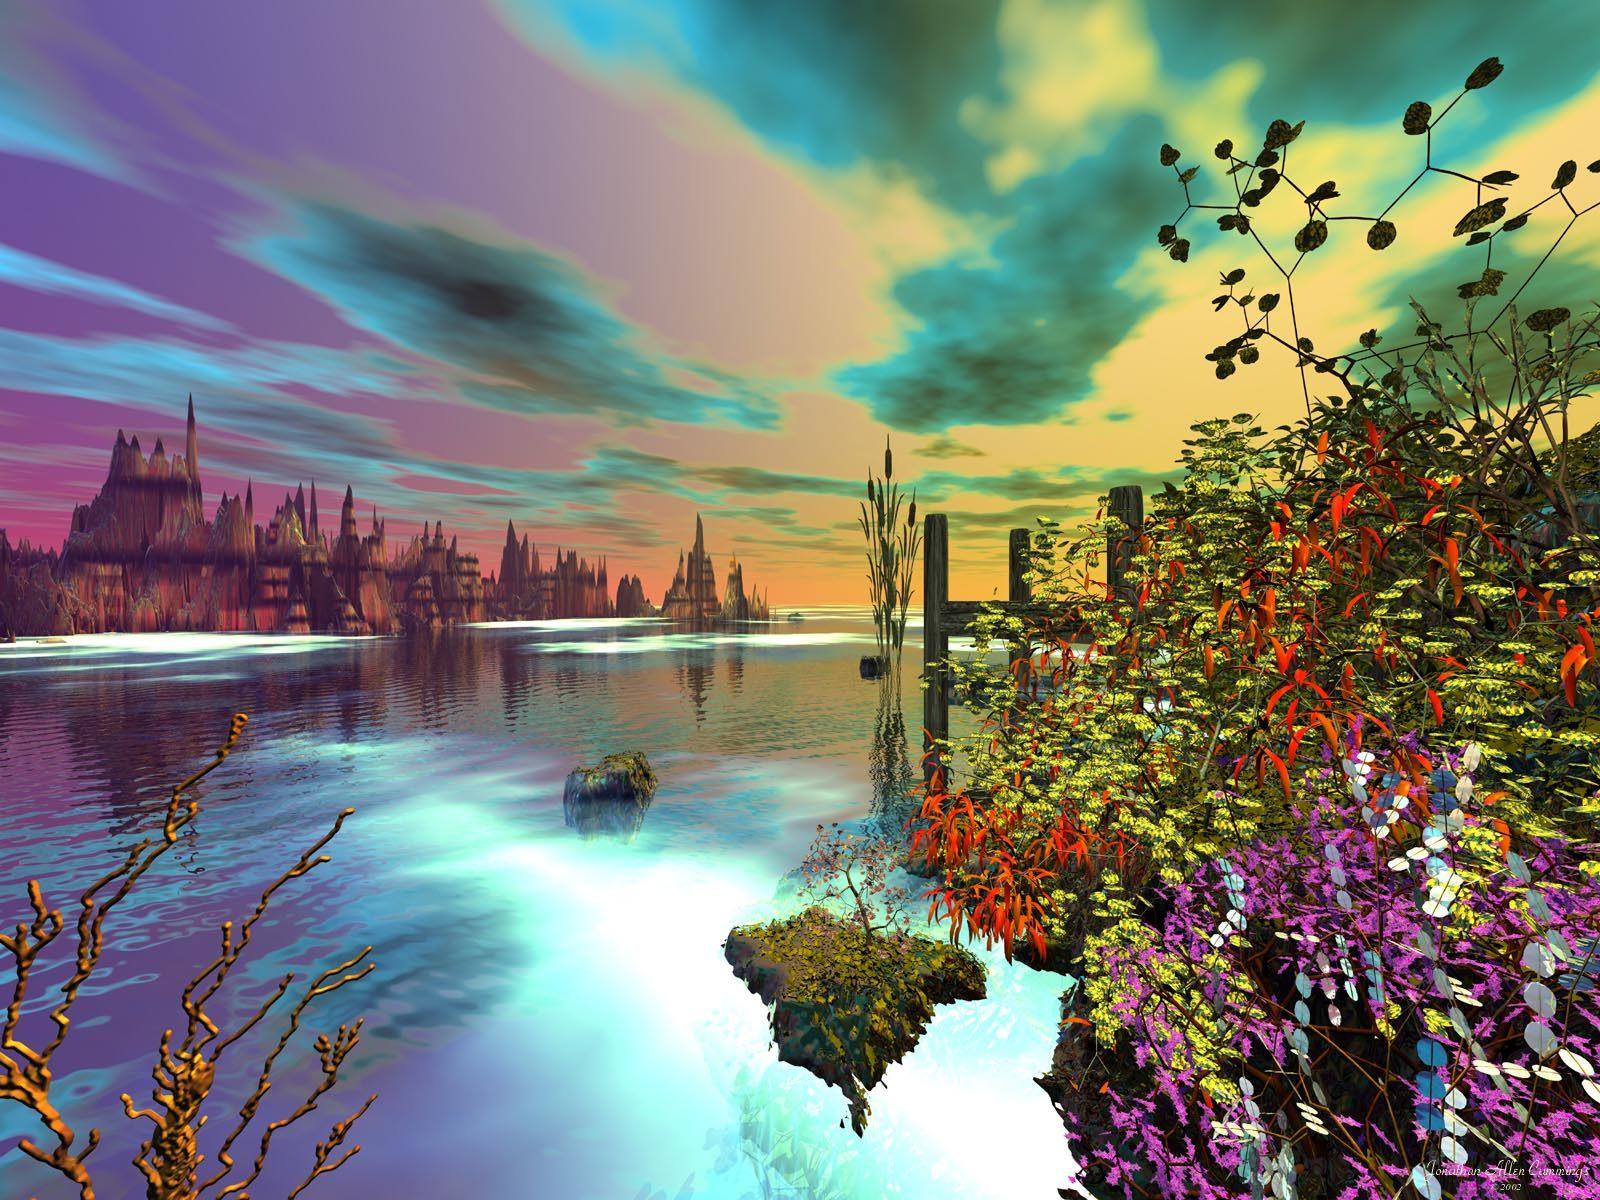 Beautiful Summer Scenery Wallpaper - WallpaperSafari  Beautiful Summer Scenes